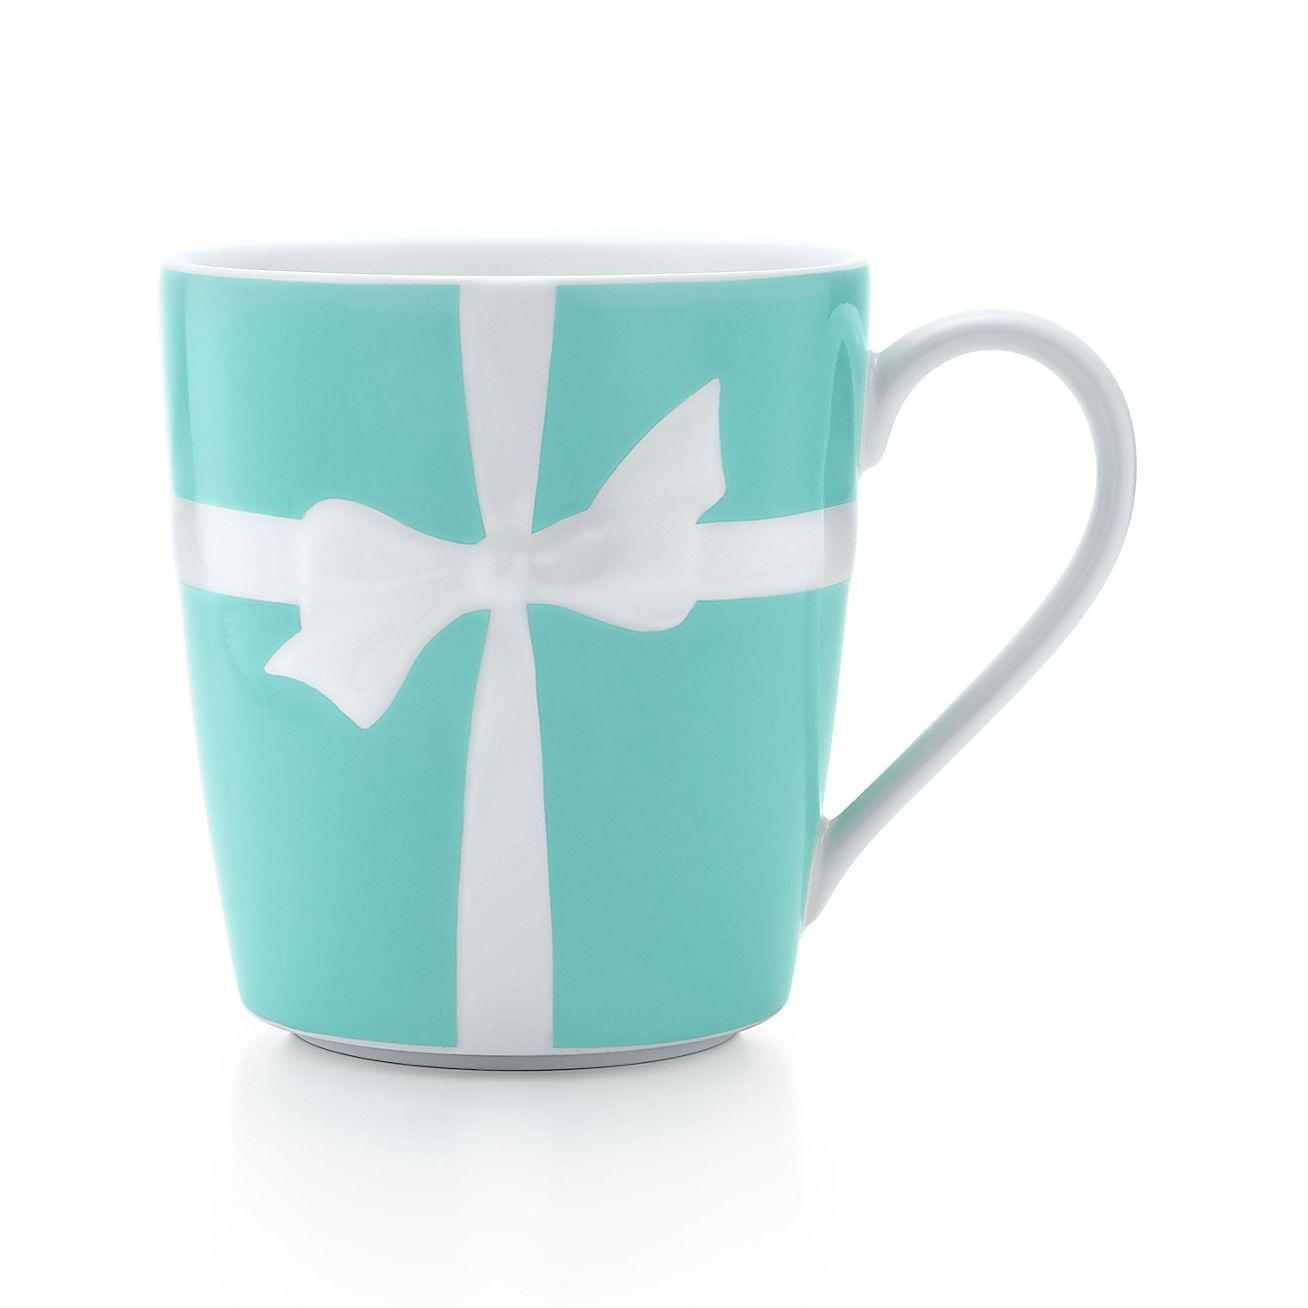 Tiffany Bows:Mug